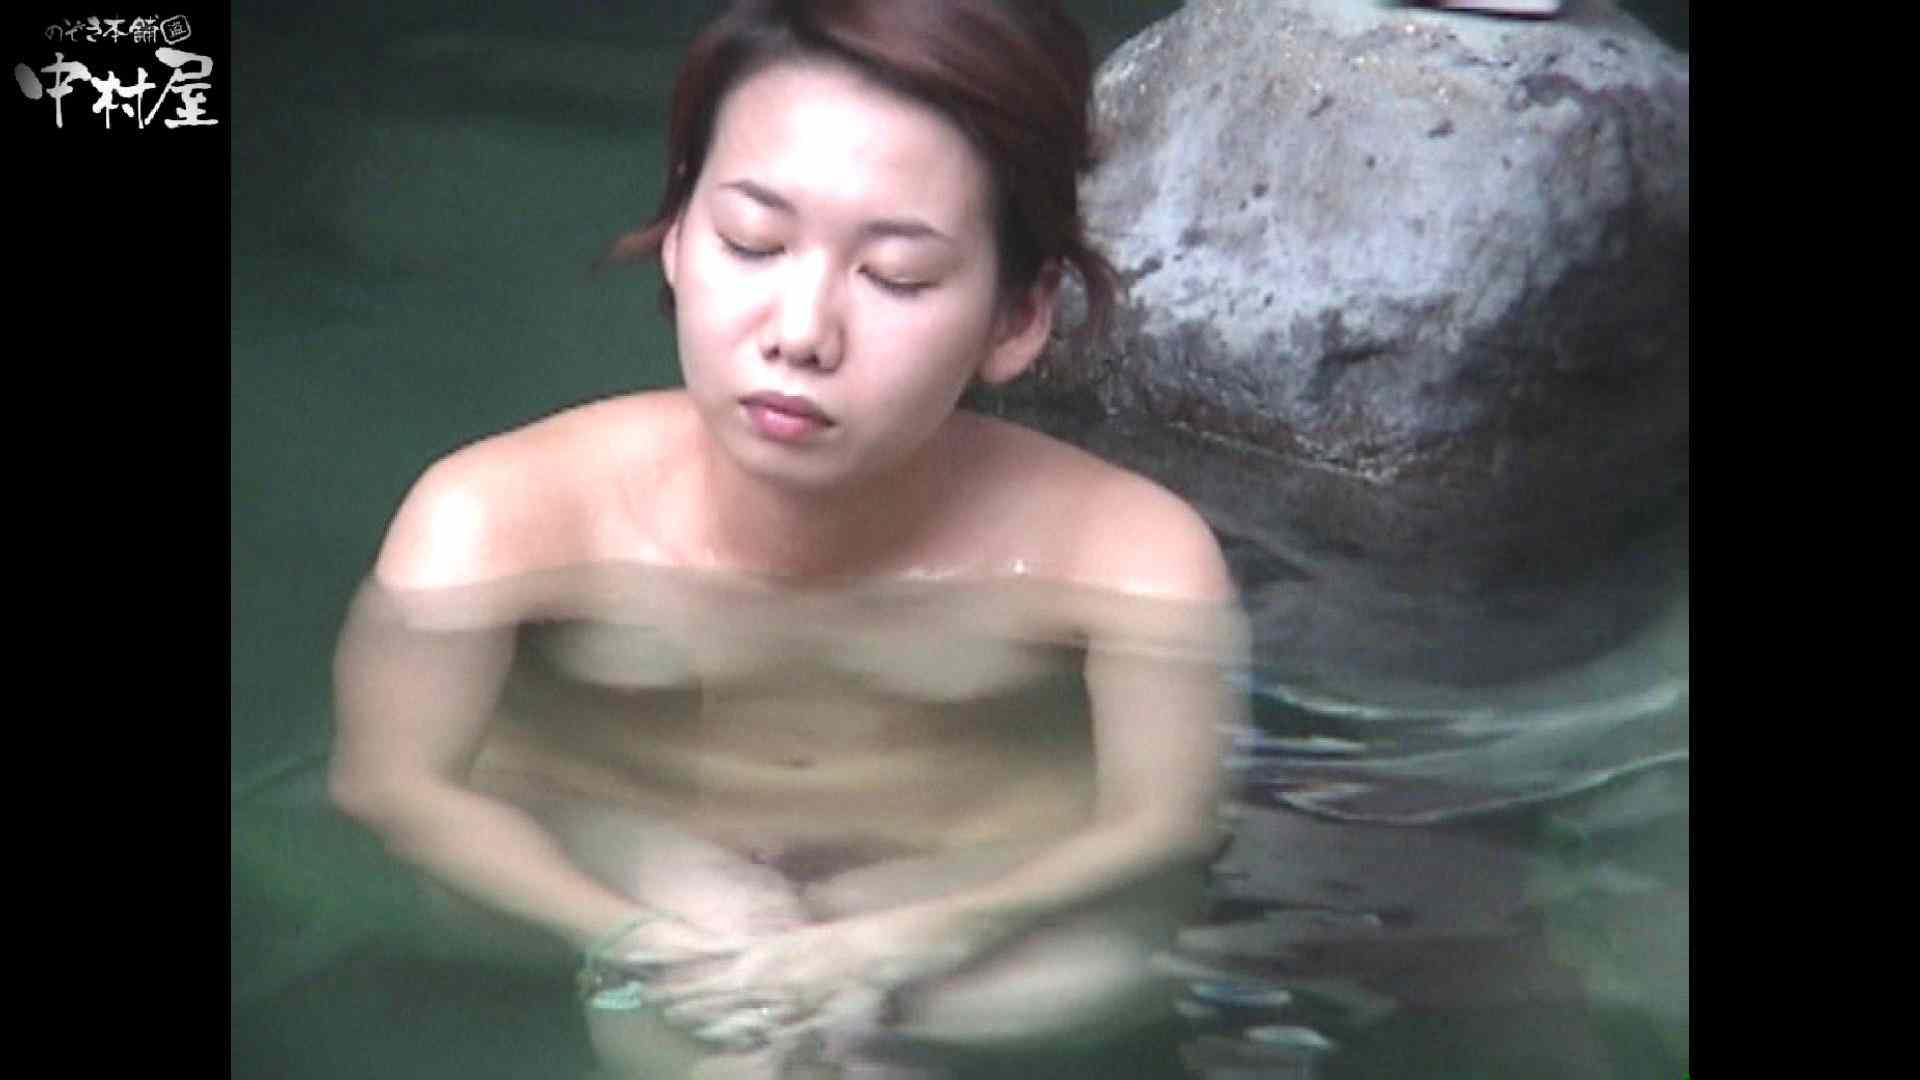 Aquaな露天風呂Vol.951 盗撮映像  93Pix 47